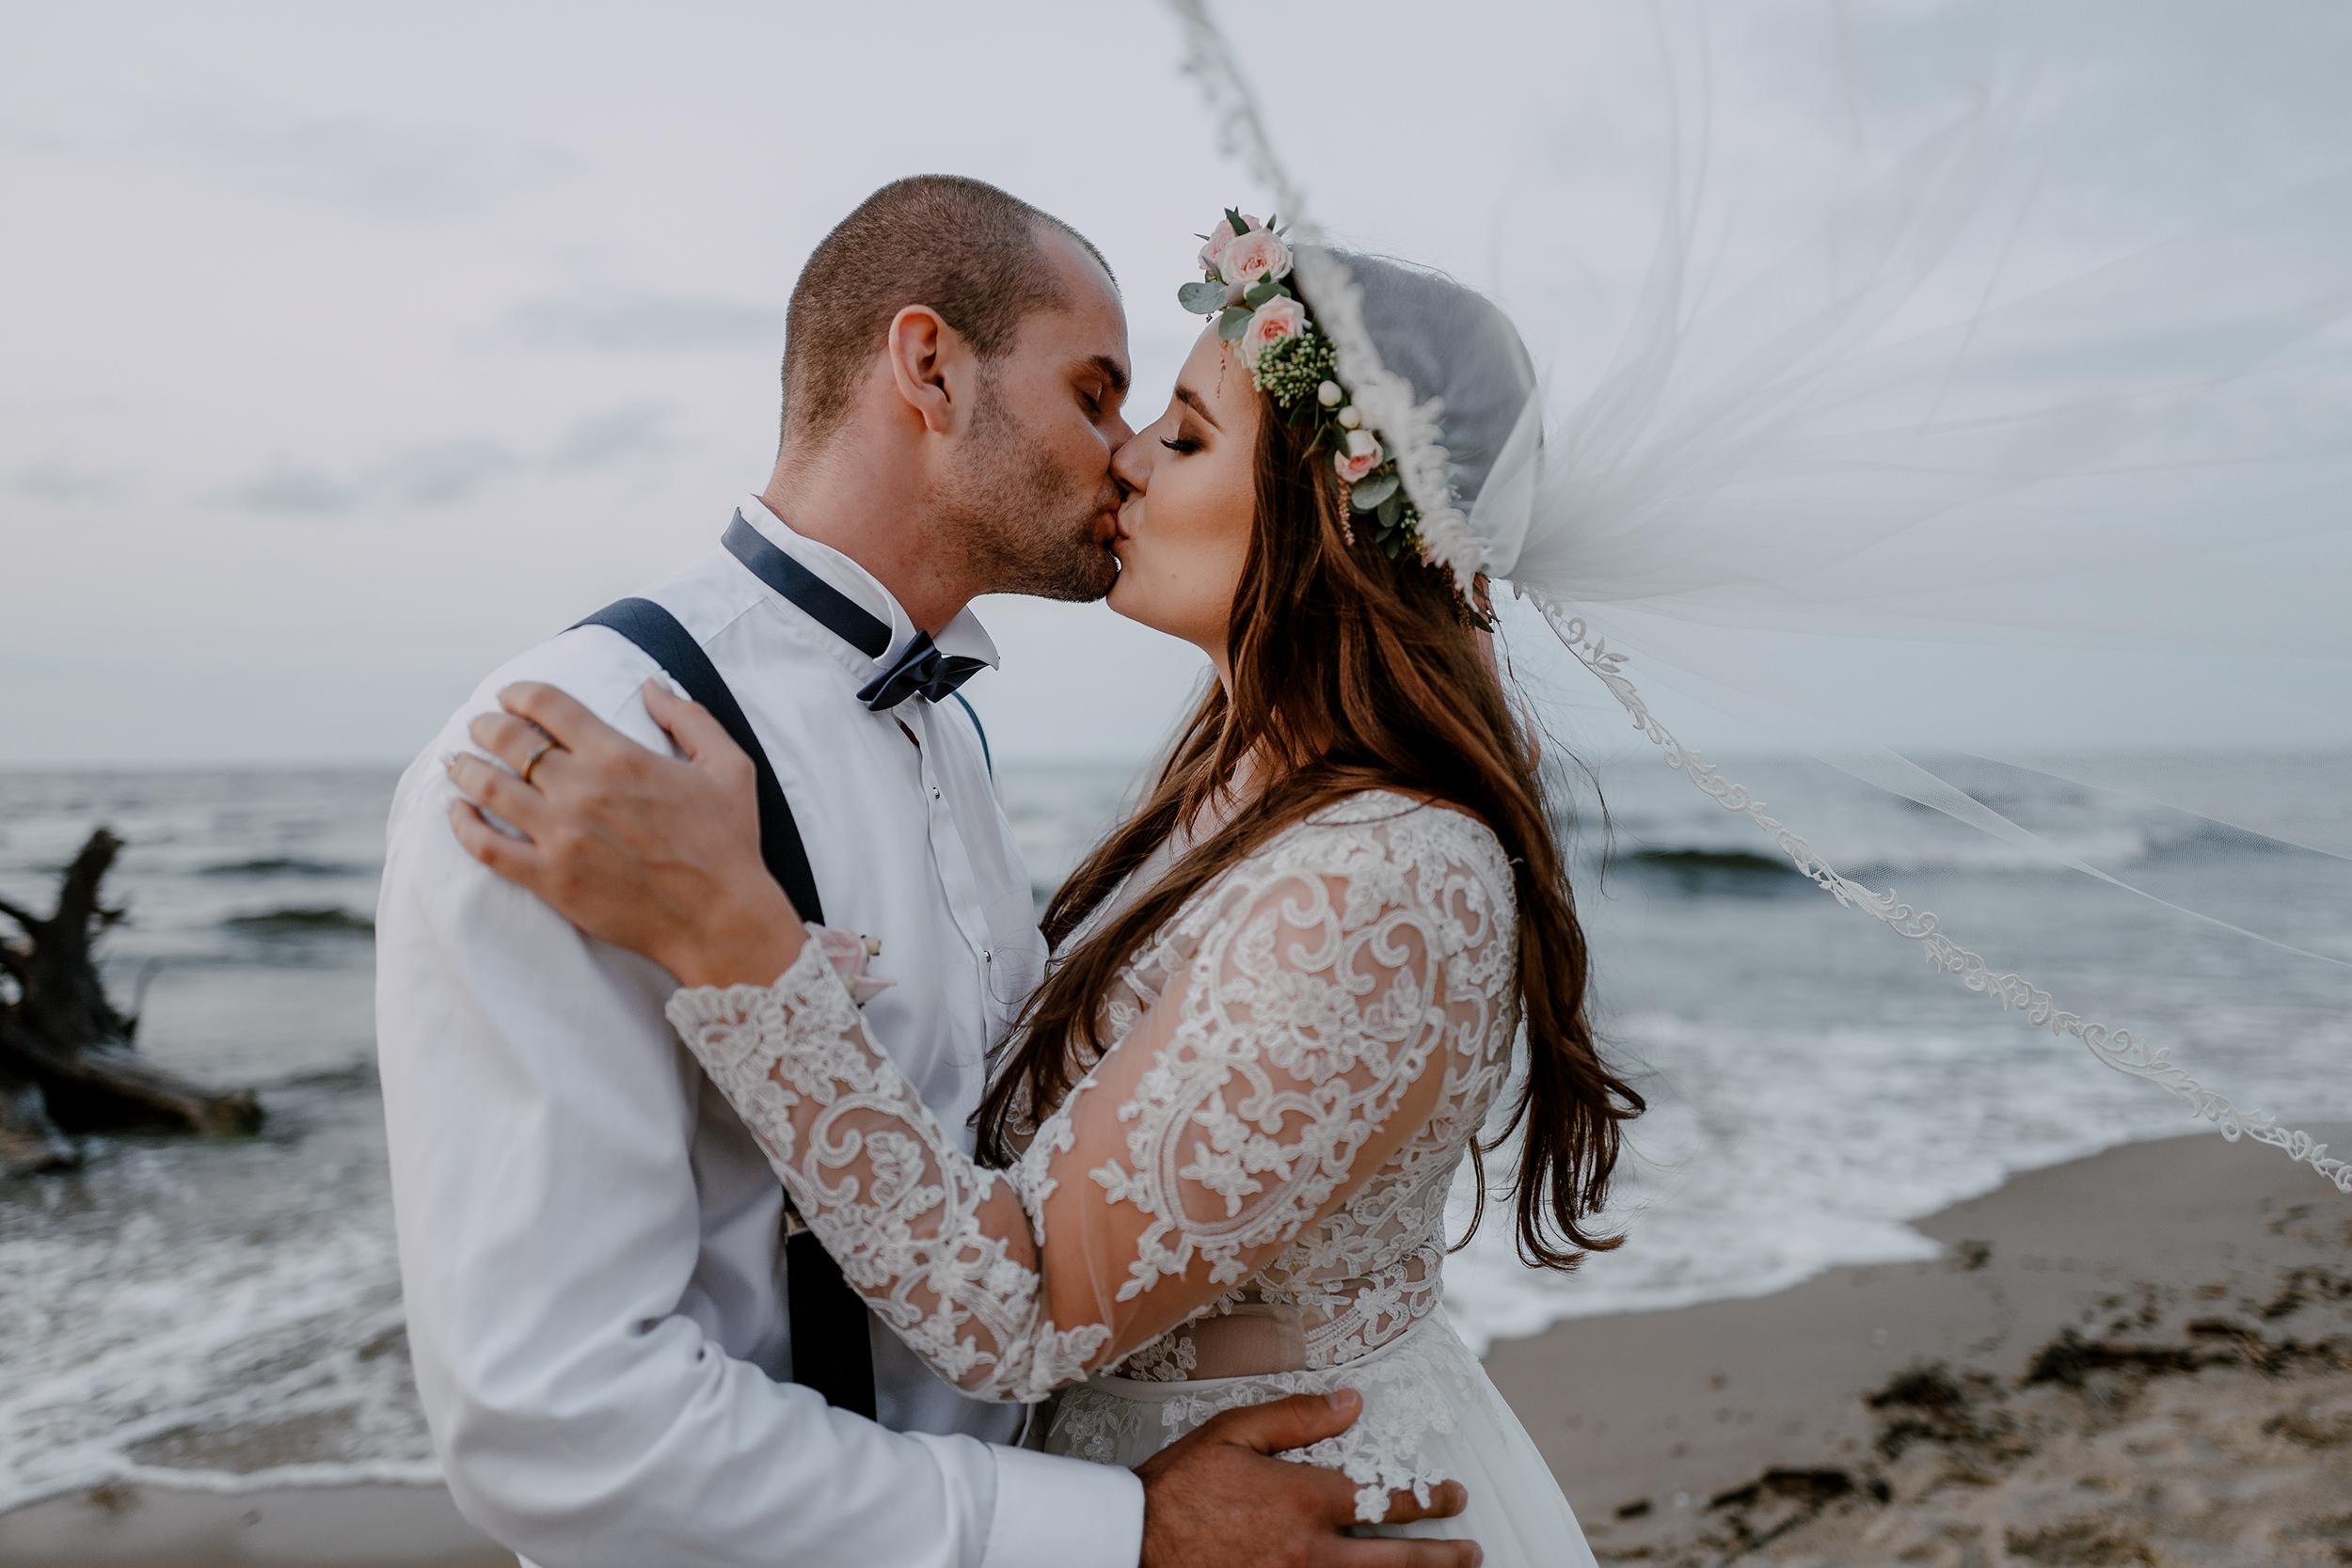 fotograf ślubny kujawsko-pomorskie.jpg